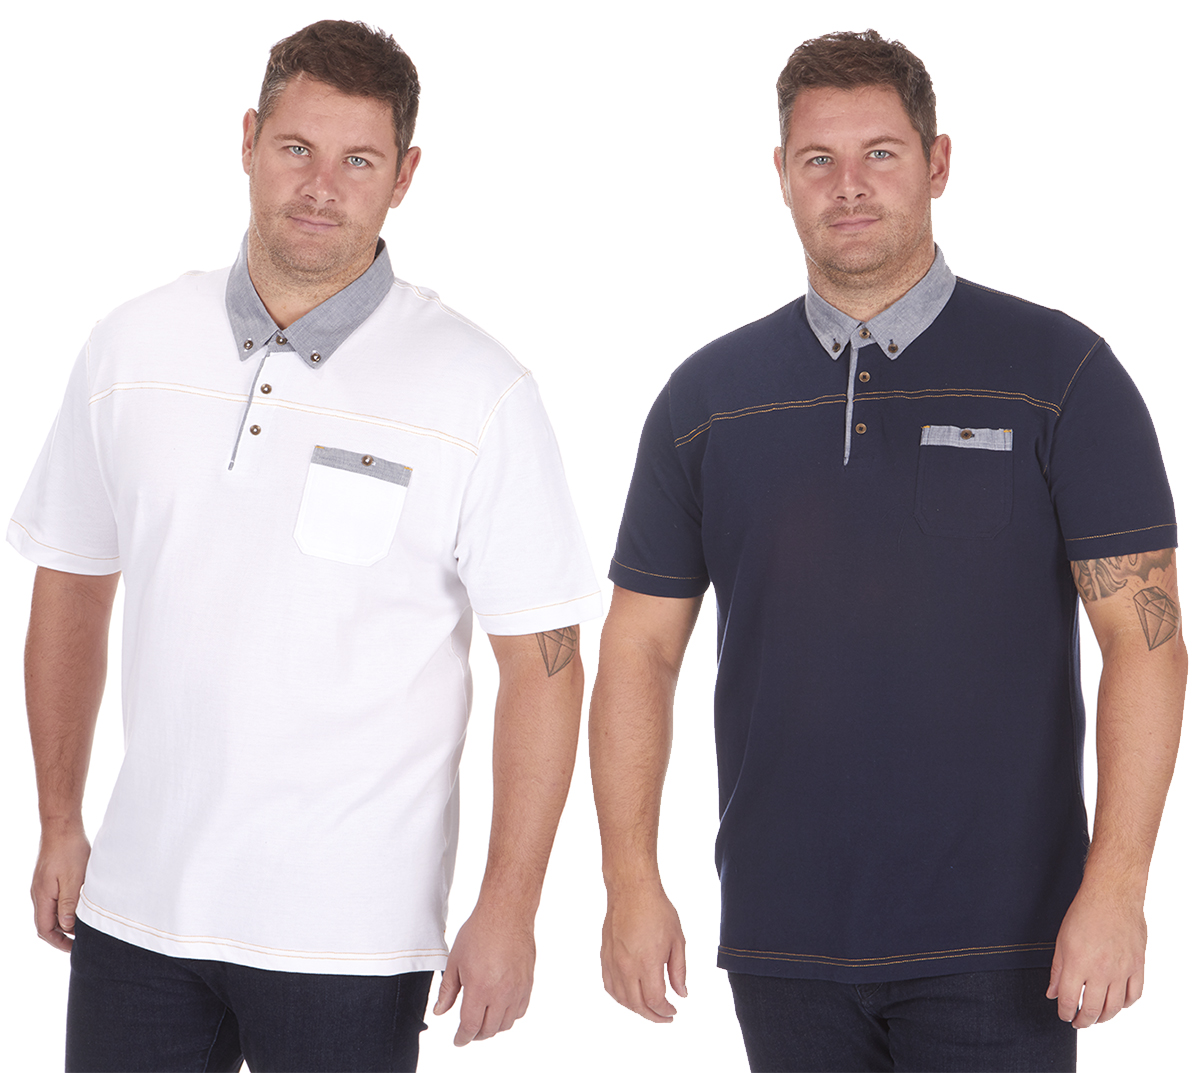 Details about Mens Plus Big Size Pique Polo Shirt T-Shirt Top Short Sleeve Casual King 3XL-5XL